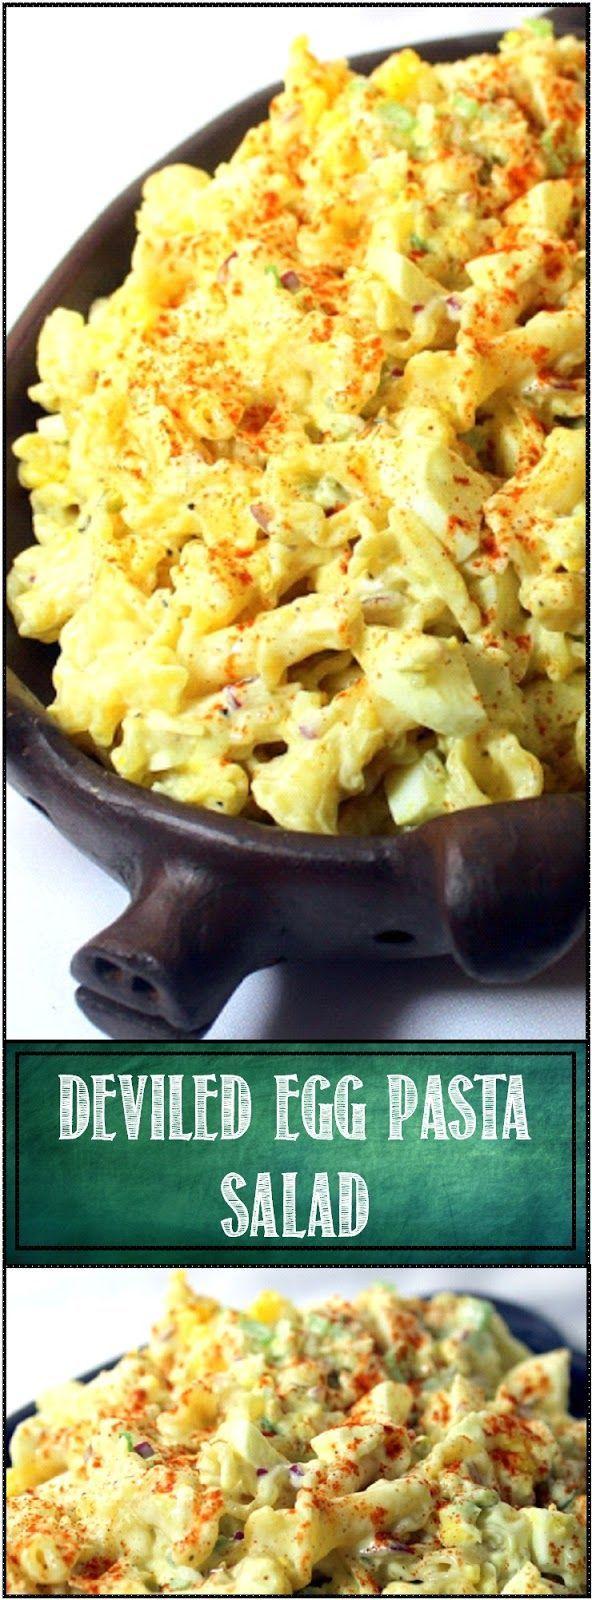 Inspired By eRecipeCards: Deviled Egg PASTA Salad - Church PotLuck Side Dish